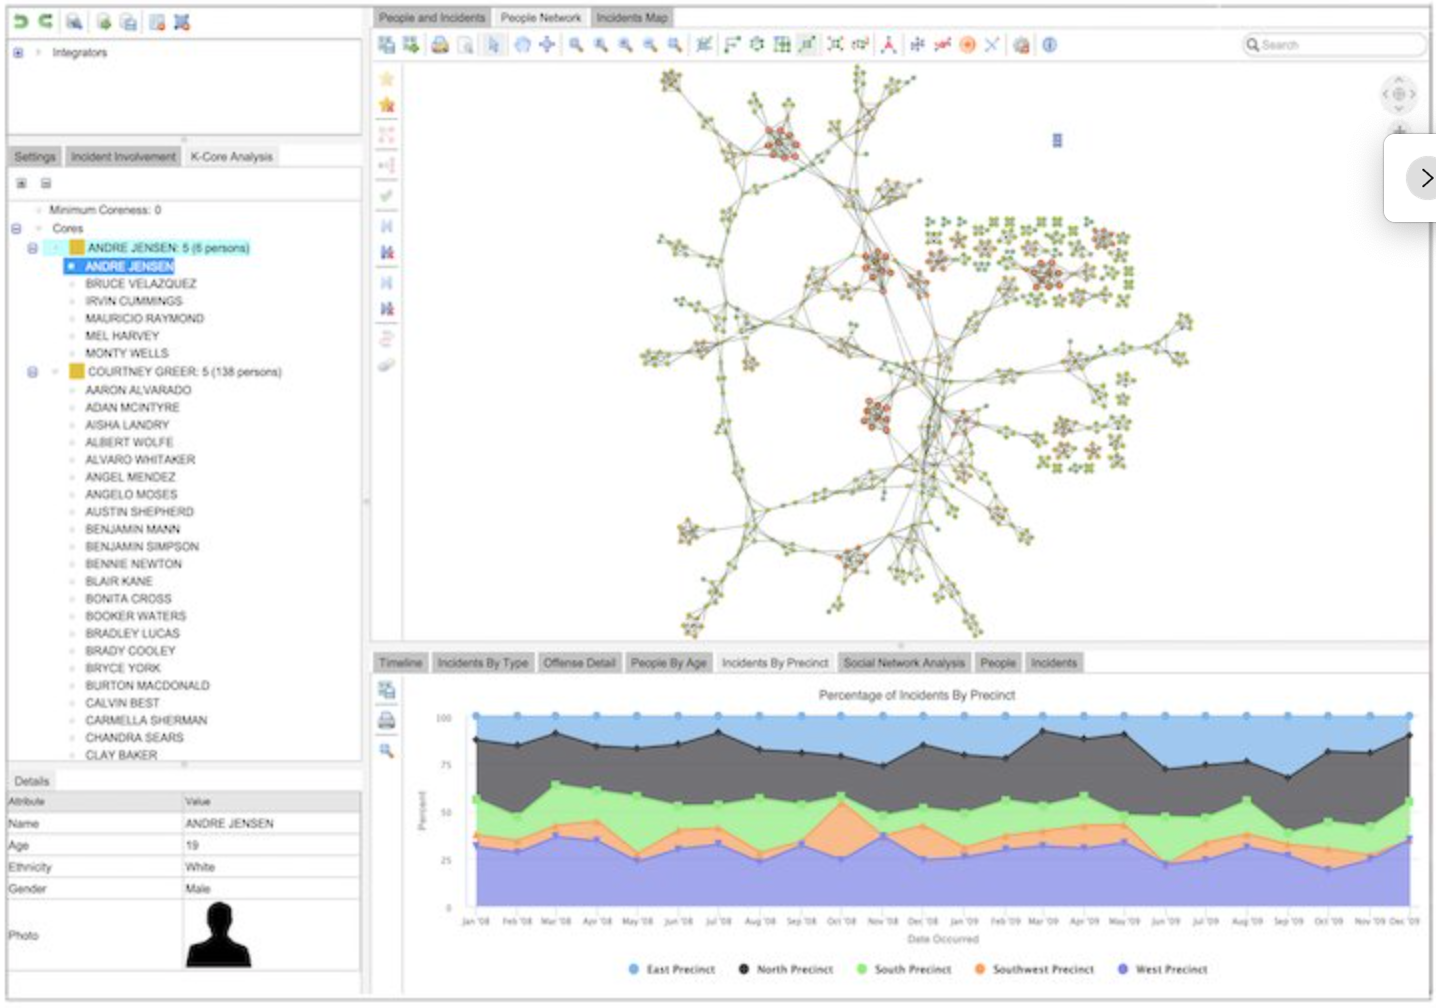 Crime Network Analysis.